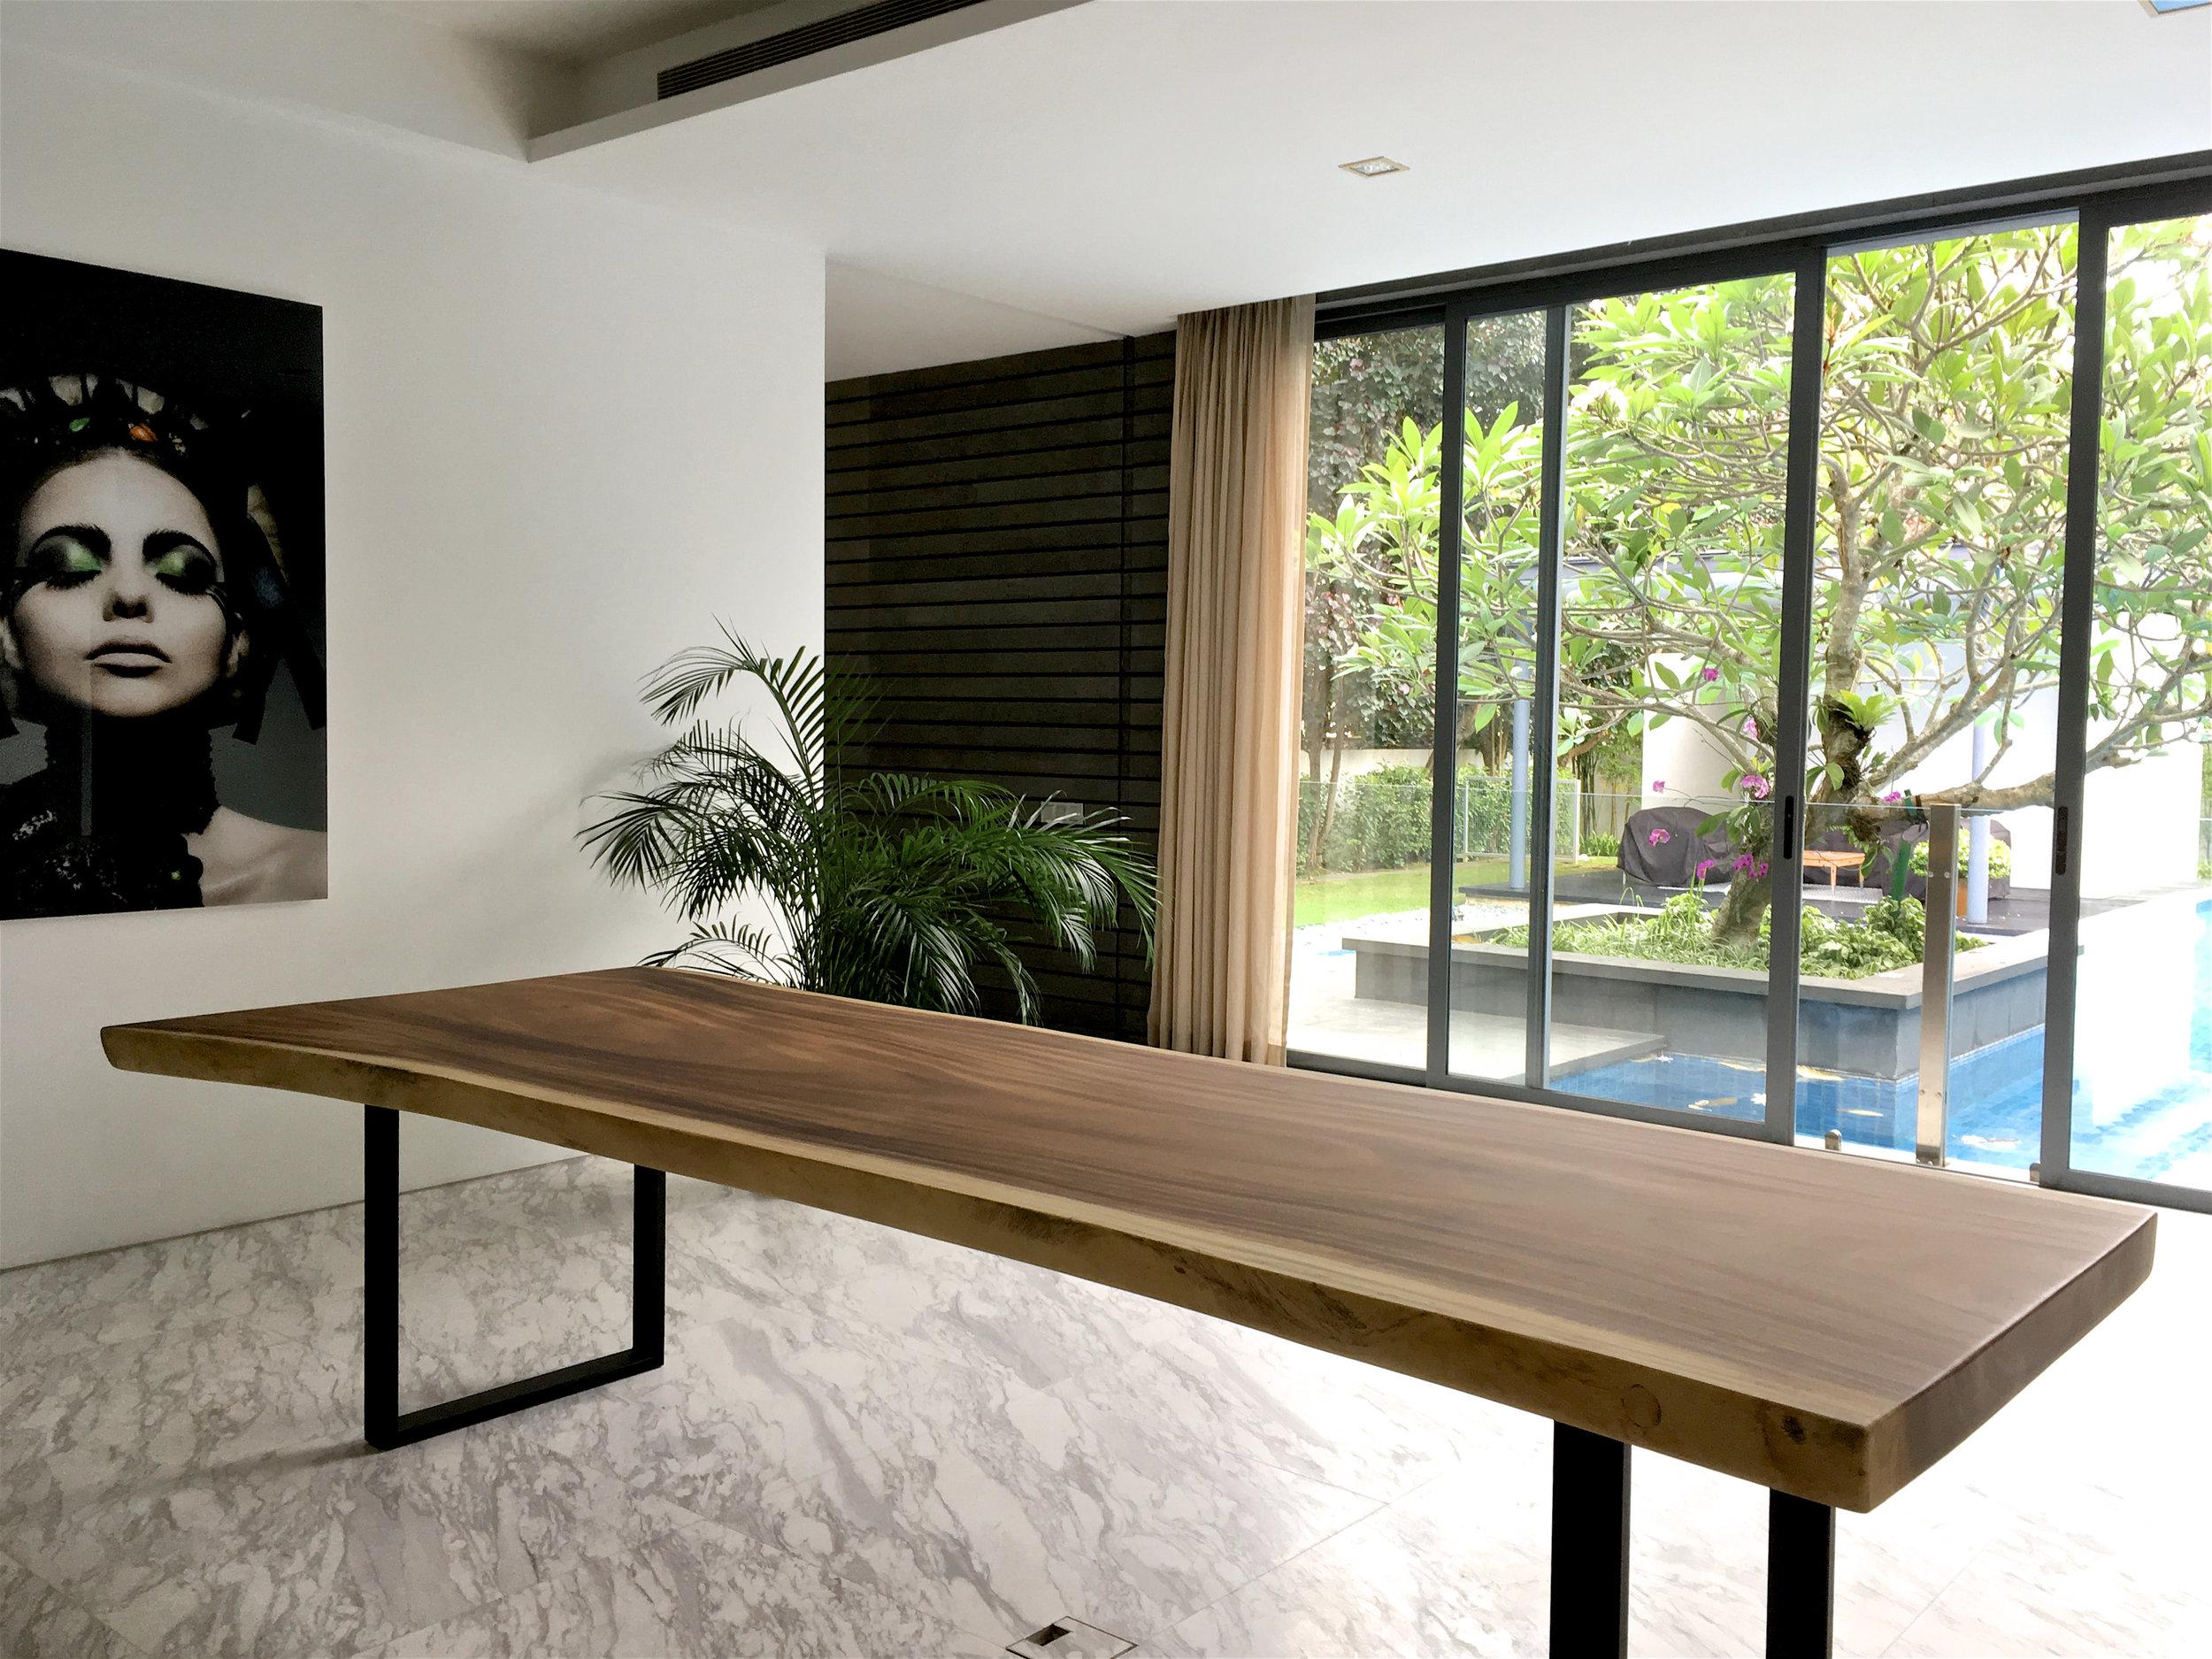 Suar Wood Table Big House // Herman Furniture Singapore.jpg